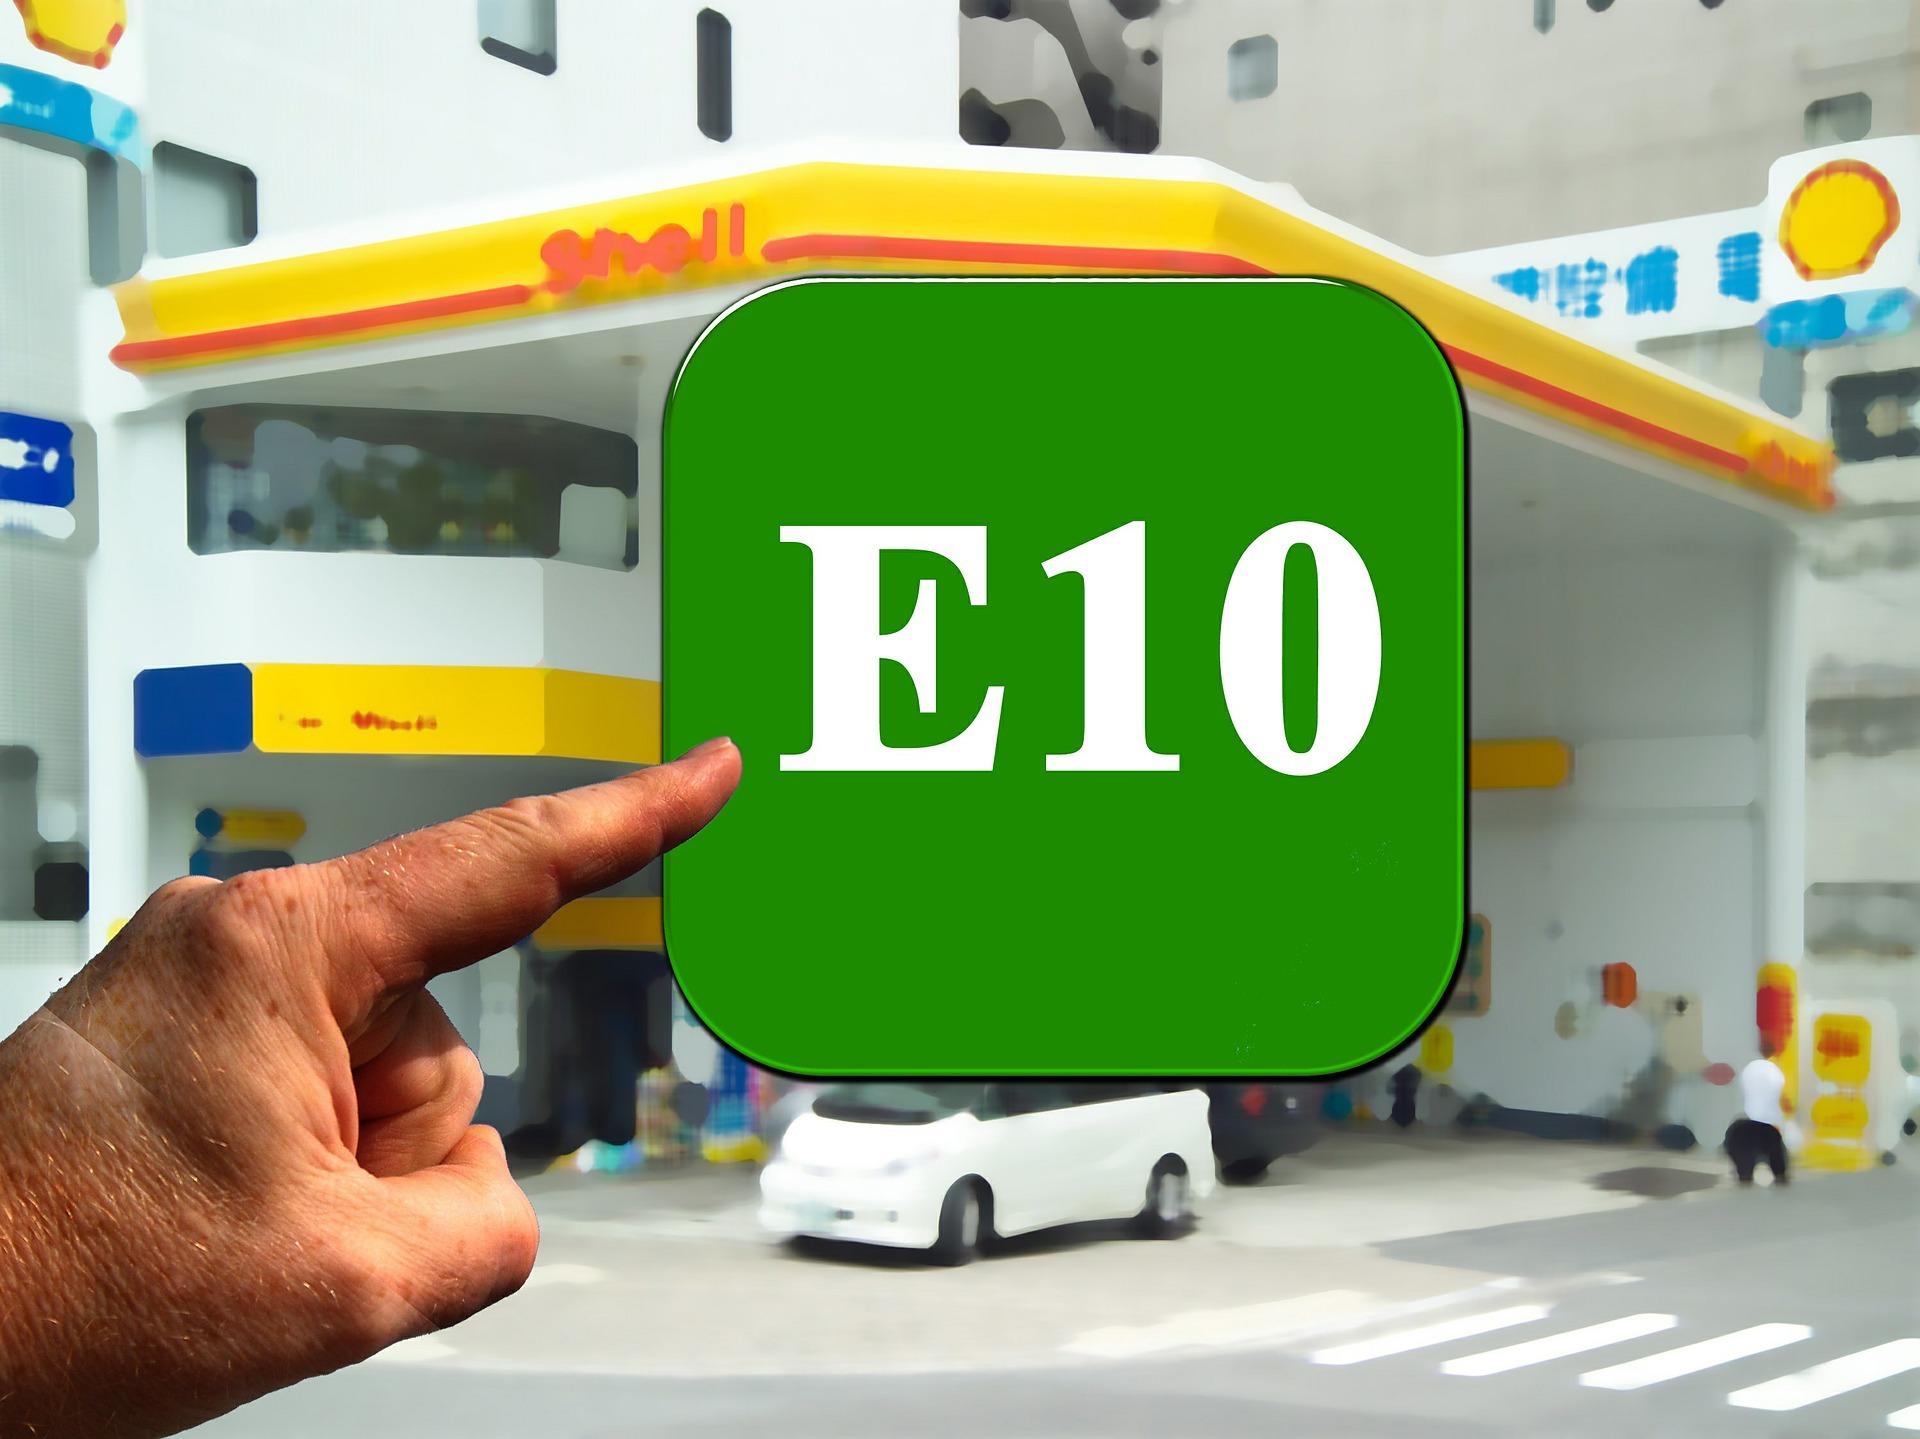 E10 – Benzin-Abzocke mal etwas anders auf mond-blog.de